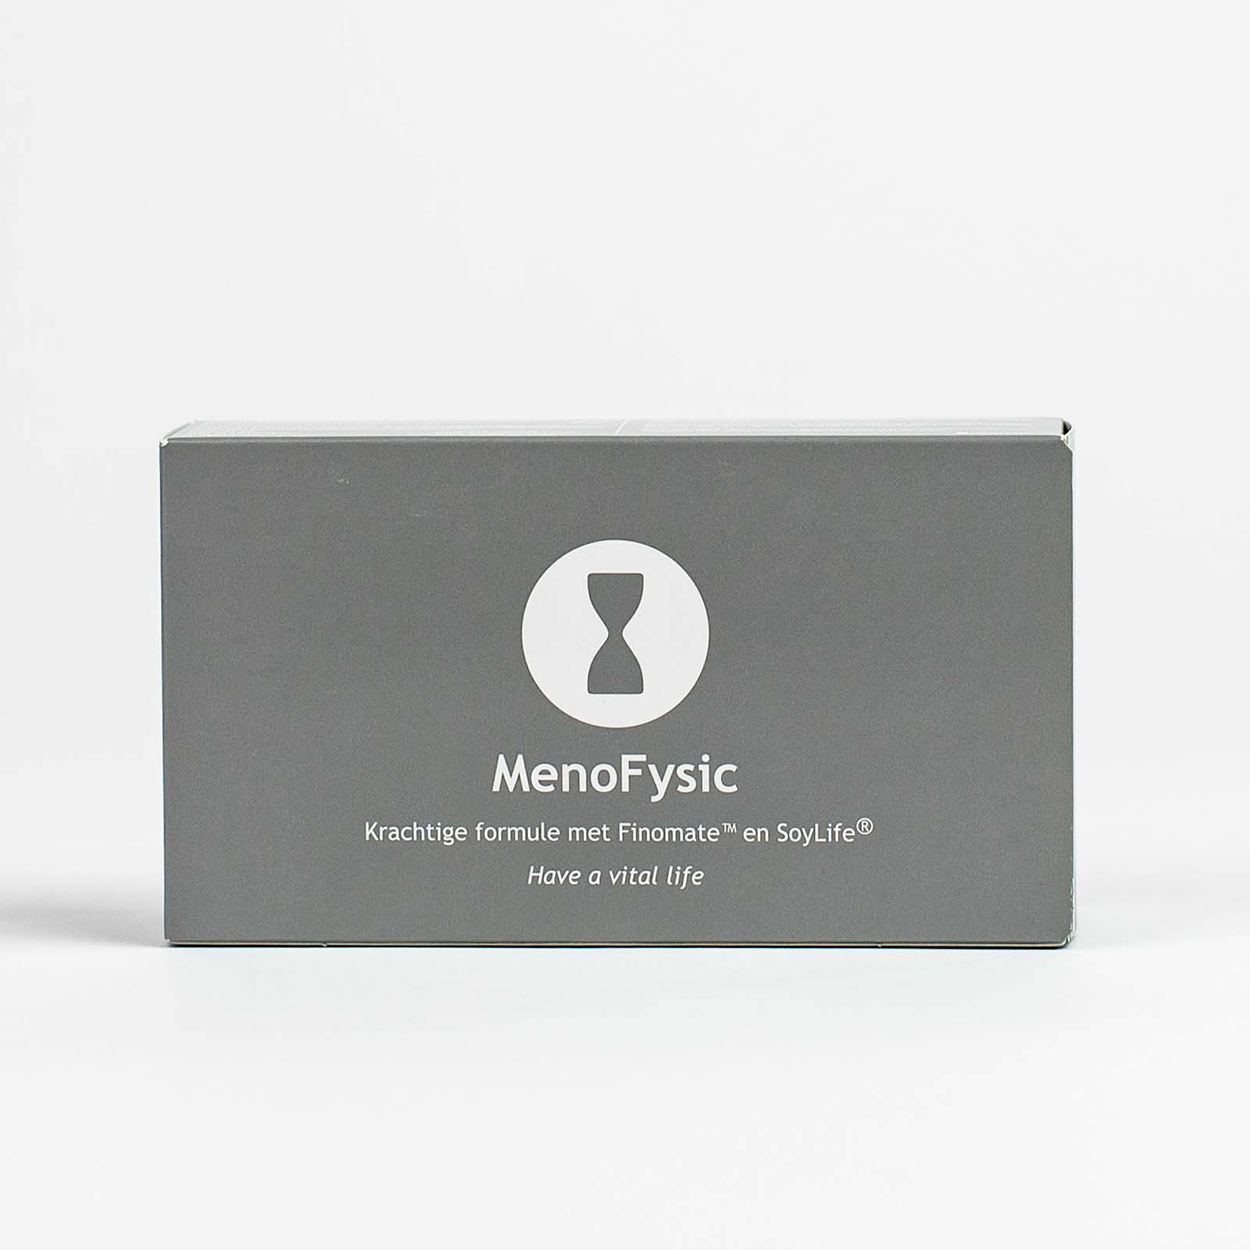 MenoFysic